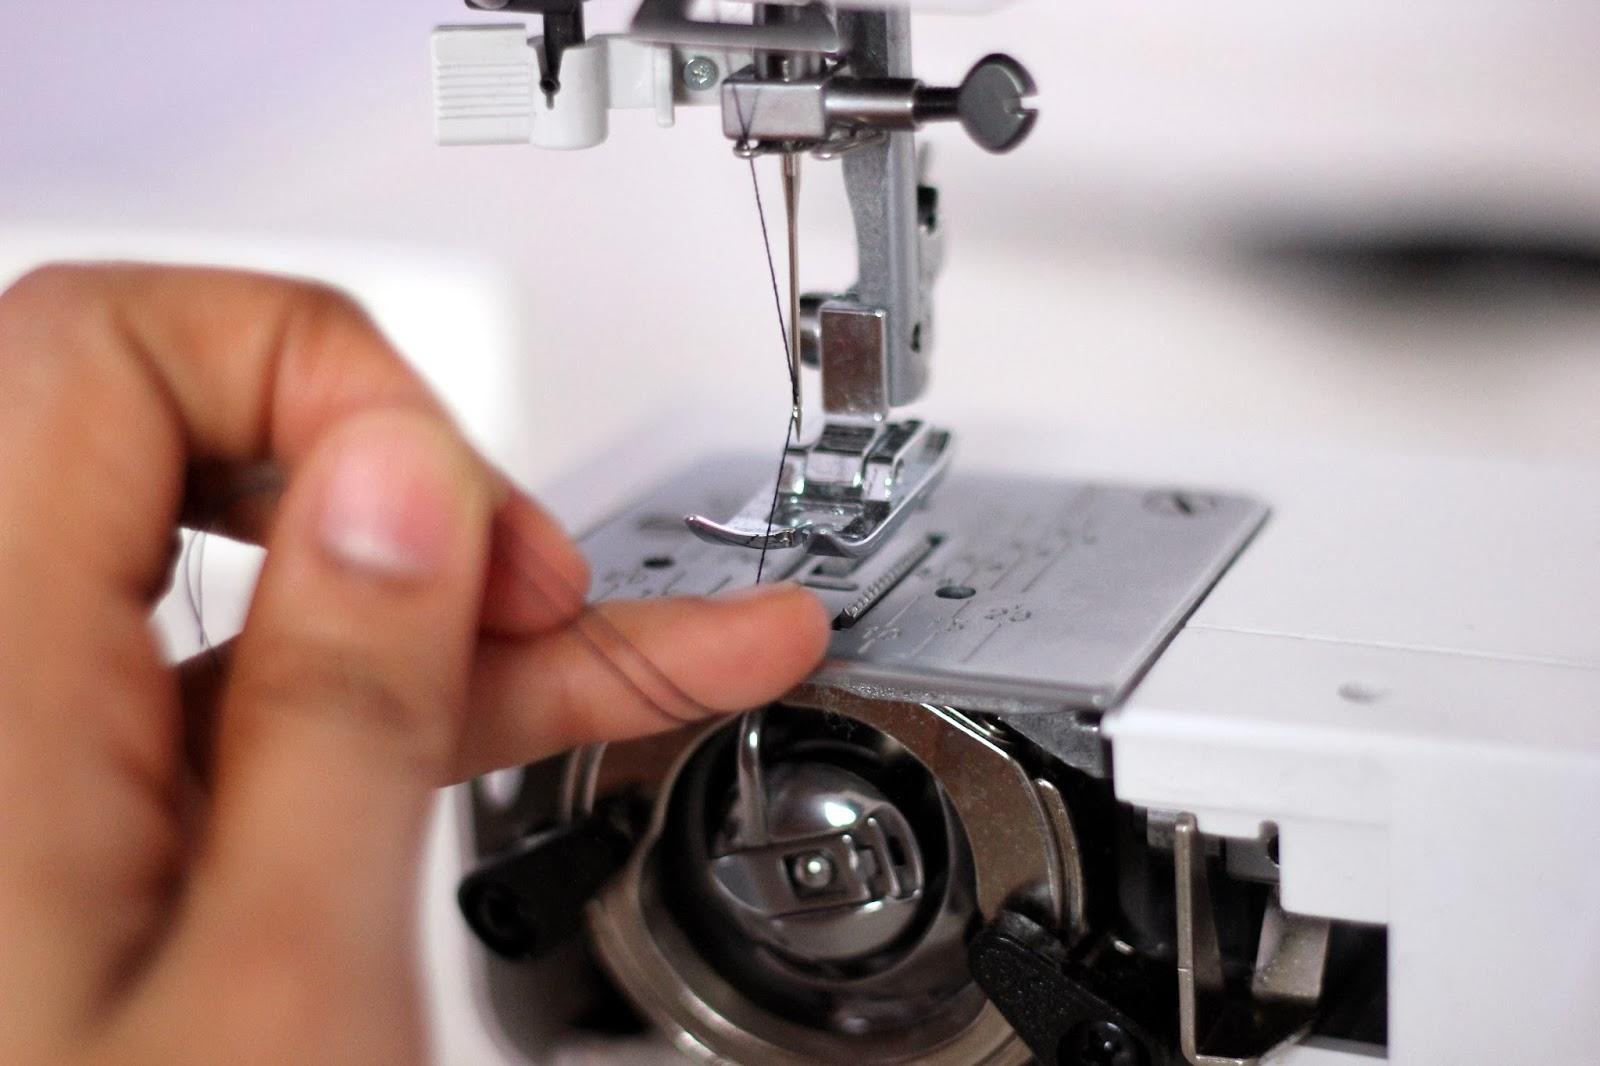 How to stitching using sewing machine